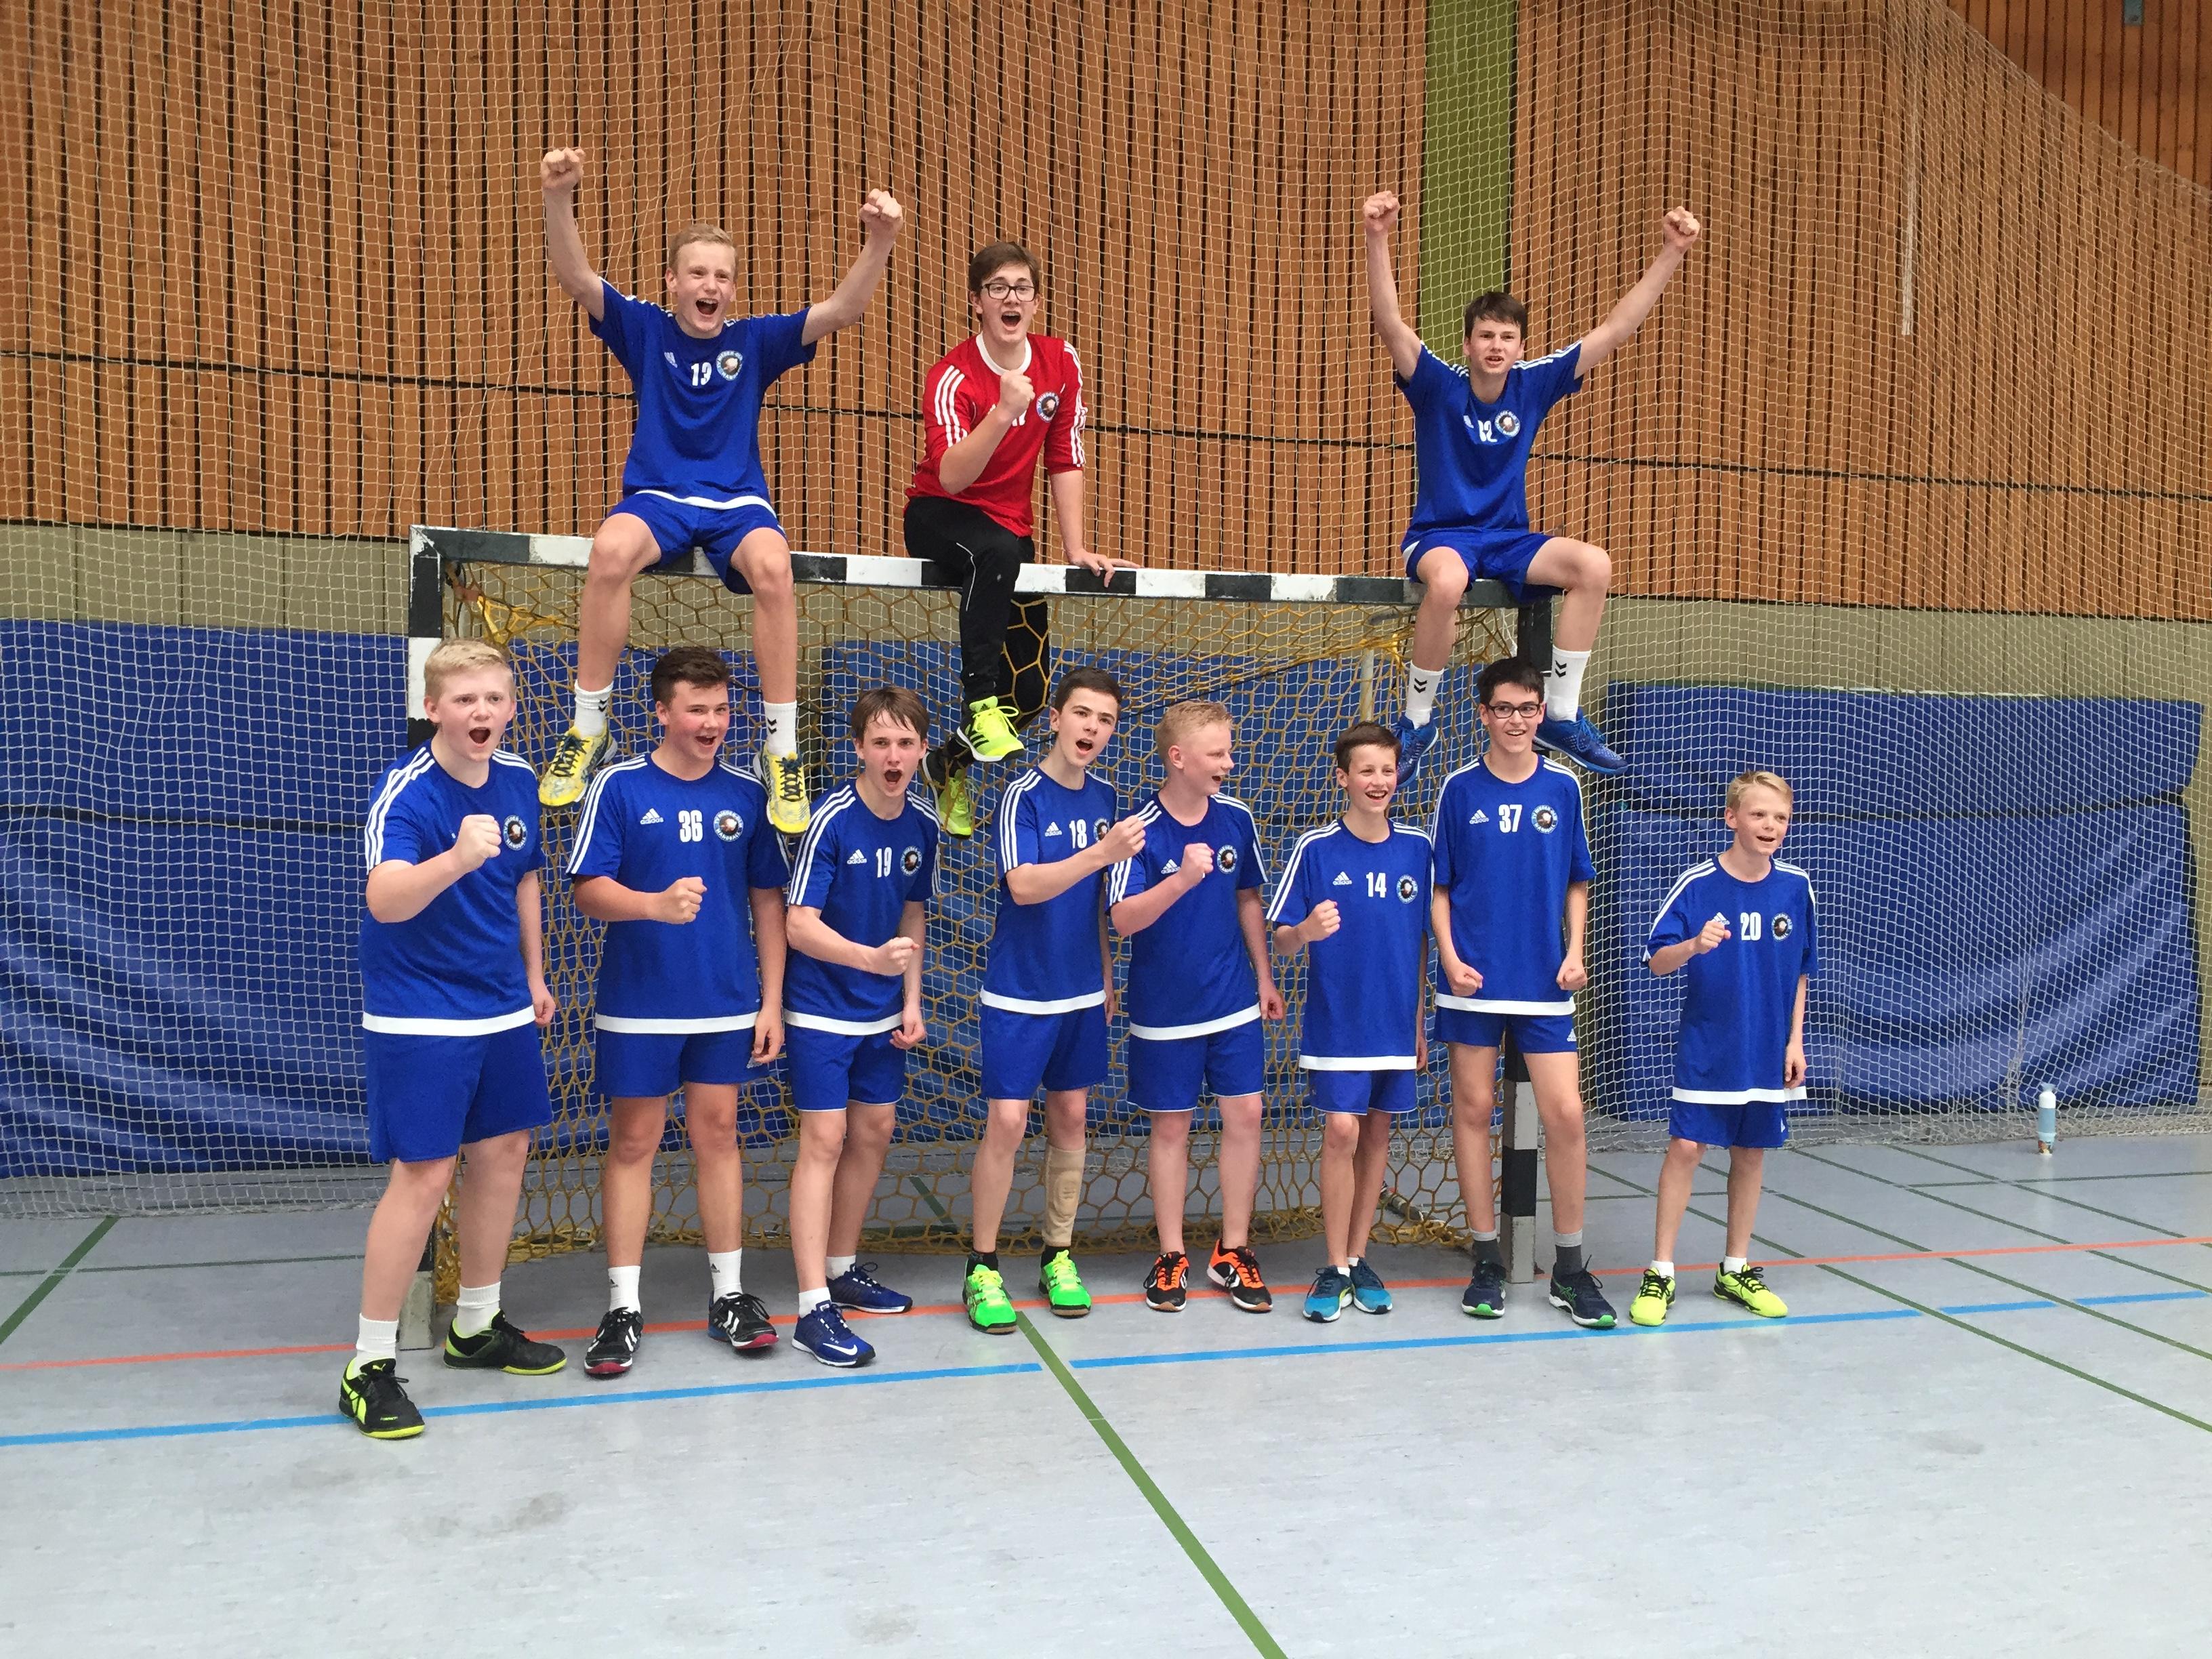 So sehen Vize-Meister aus! männl. C-Jugend Kreisklasse: TV Nieder-Olm II – HSG Worms 36:14 (16:9)